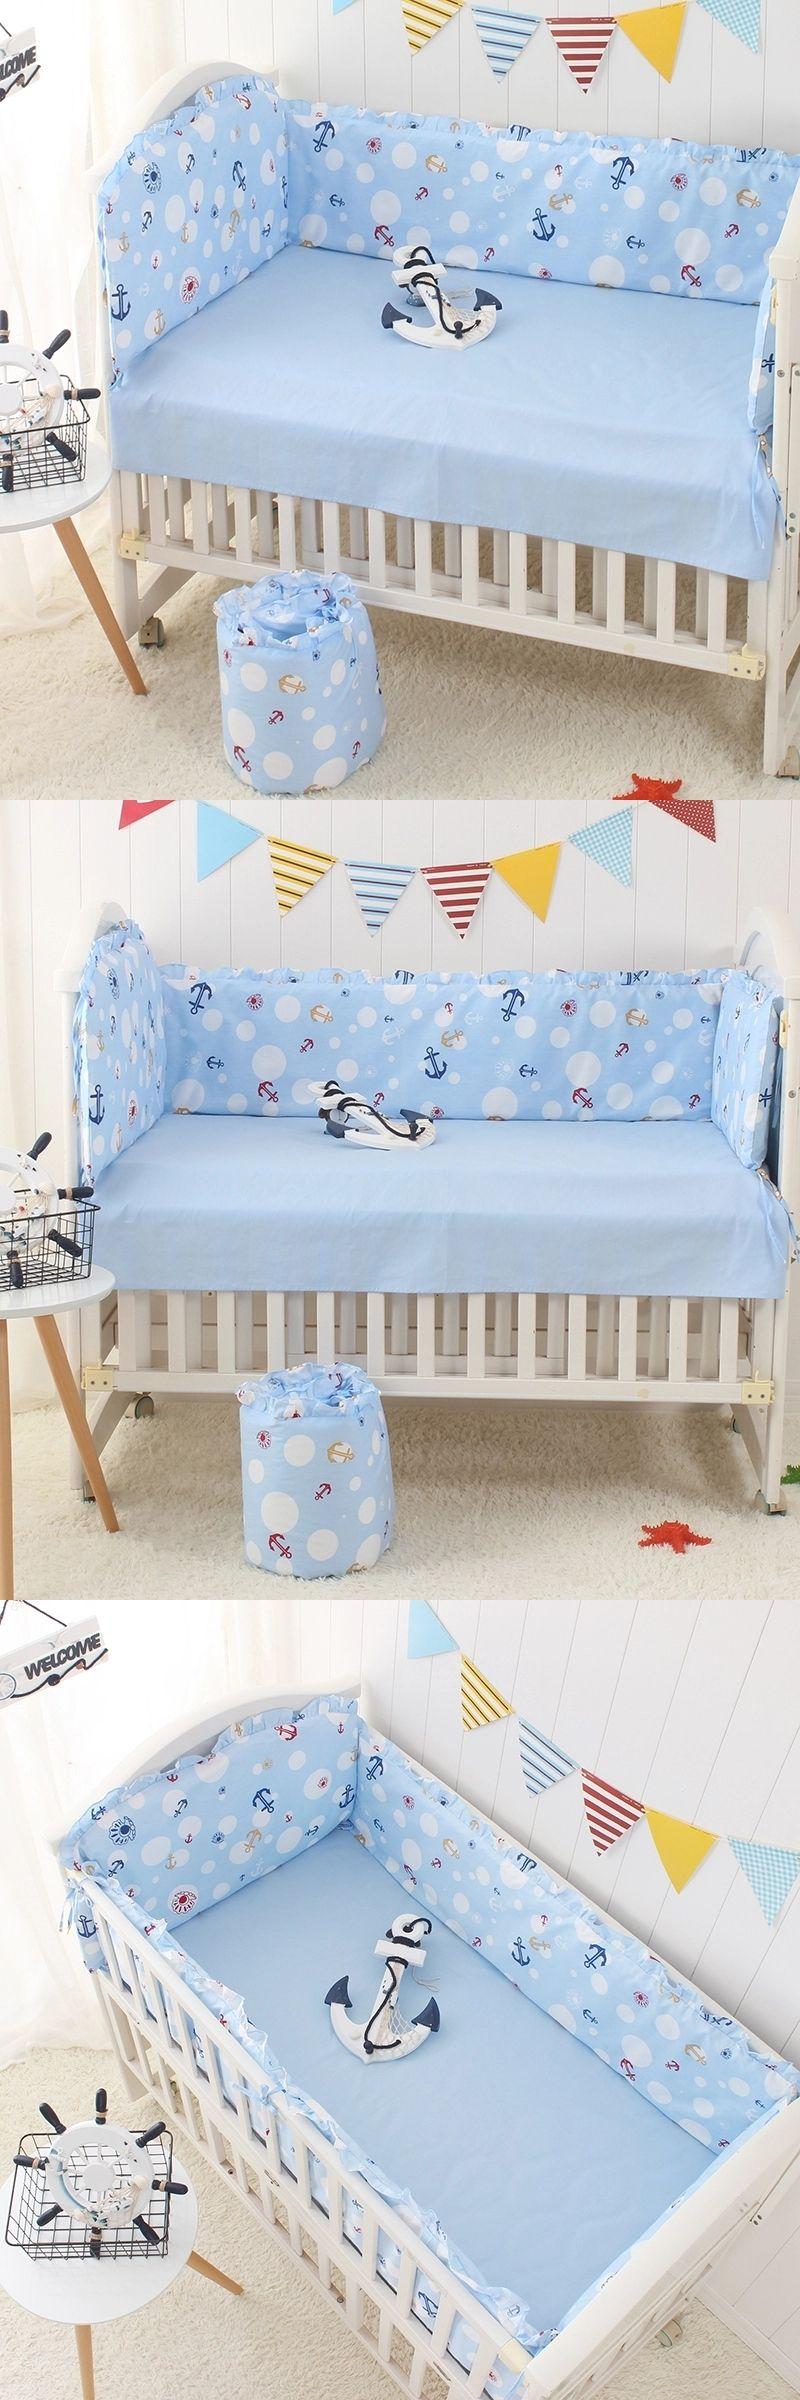 Multi Colours 5 pcs/set Baby Crib Bumper Sets Nursery,Cartoon ...